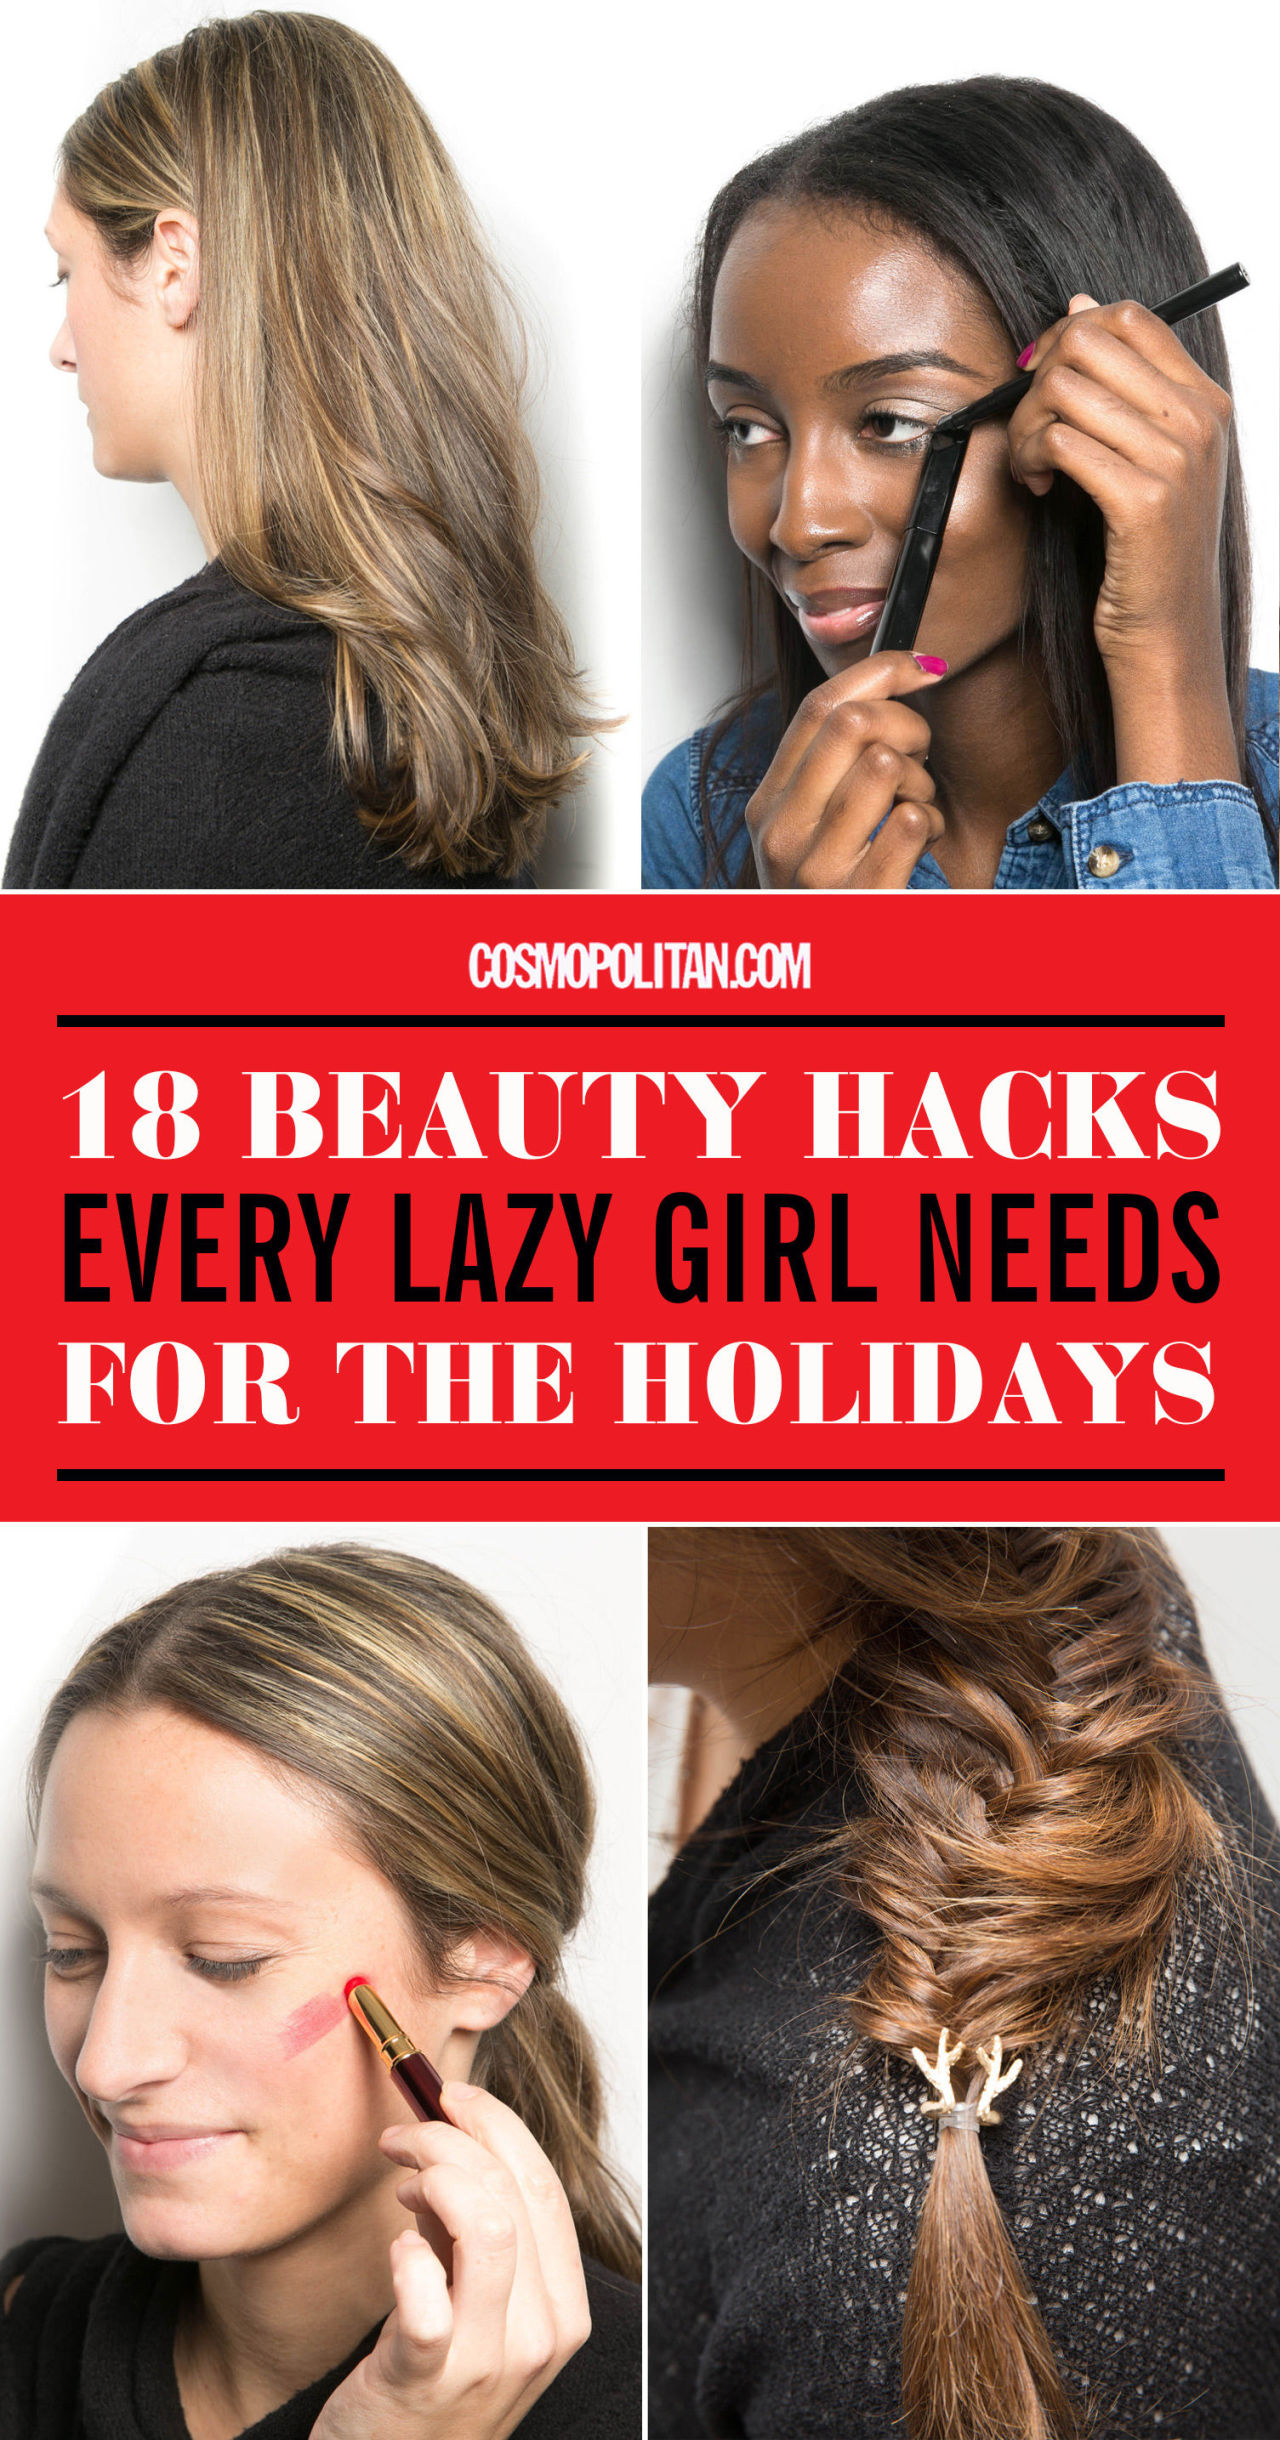 18 Beauty Salon Website Templates: Lazy Girl Holiday Makeup Tips